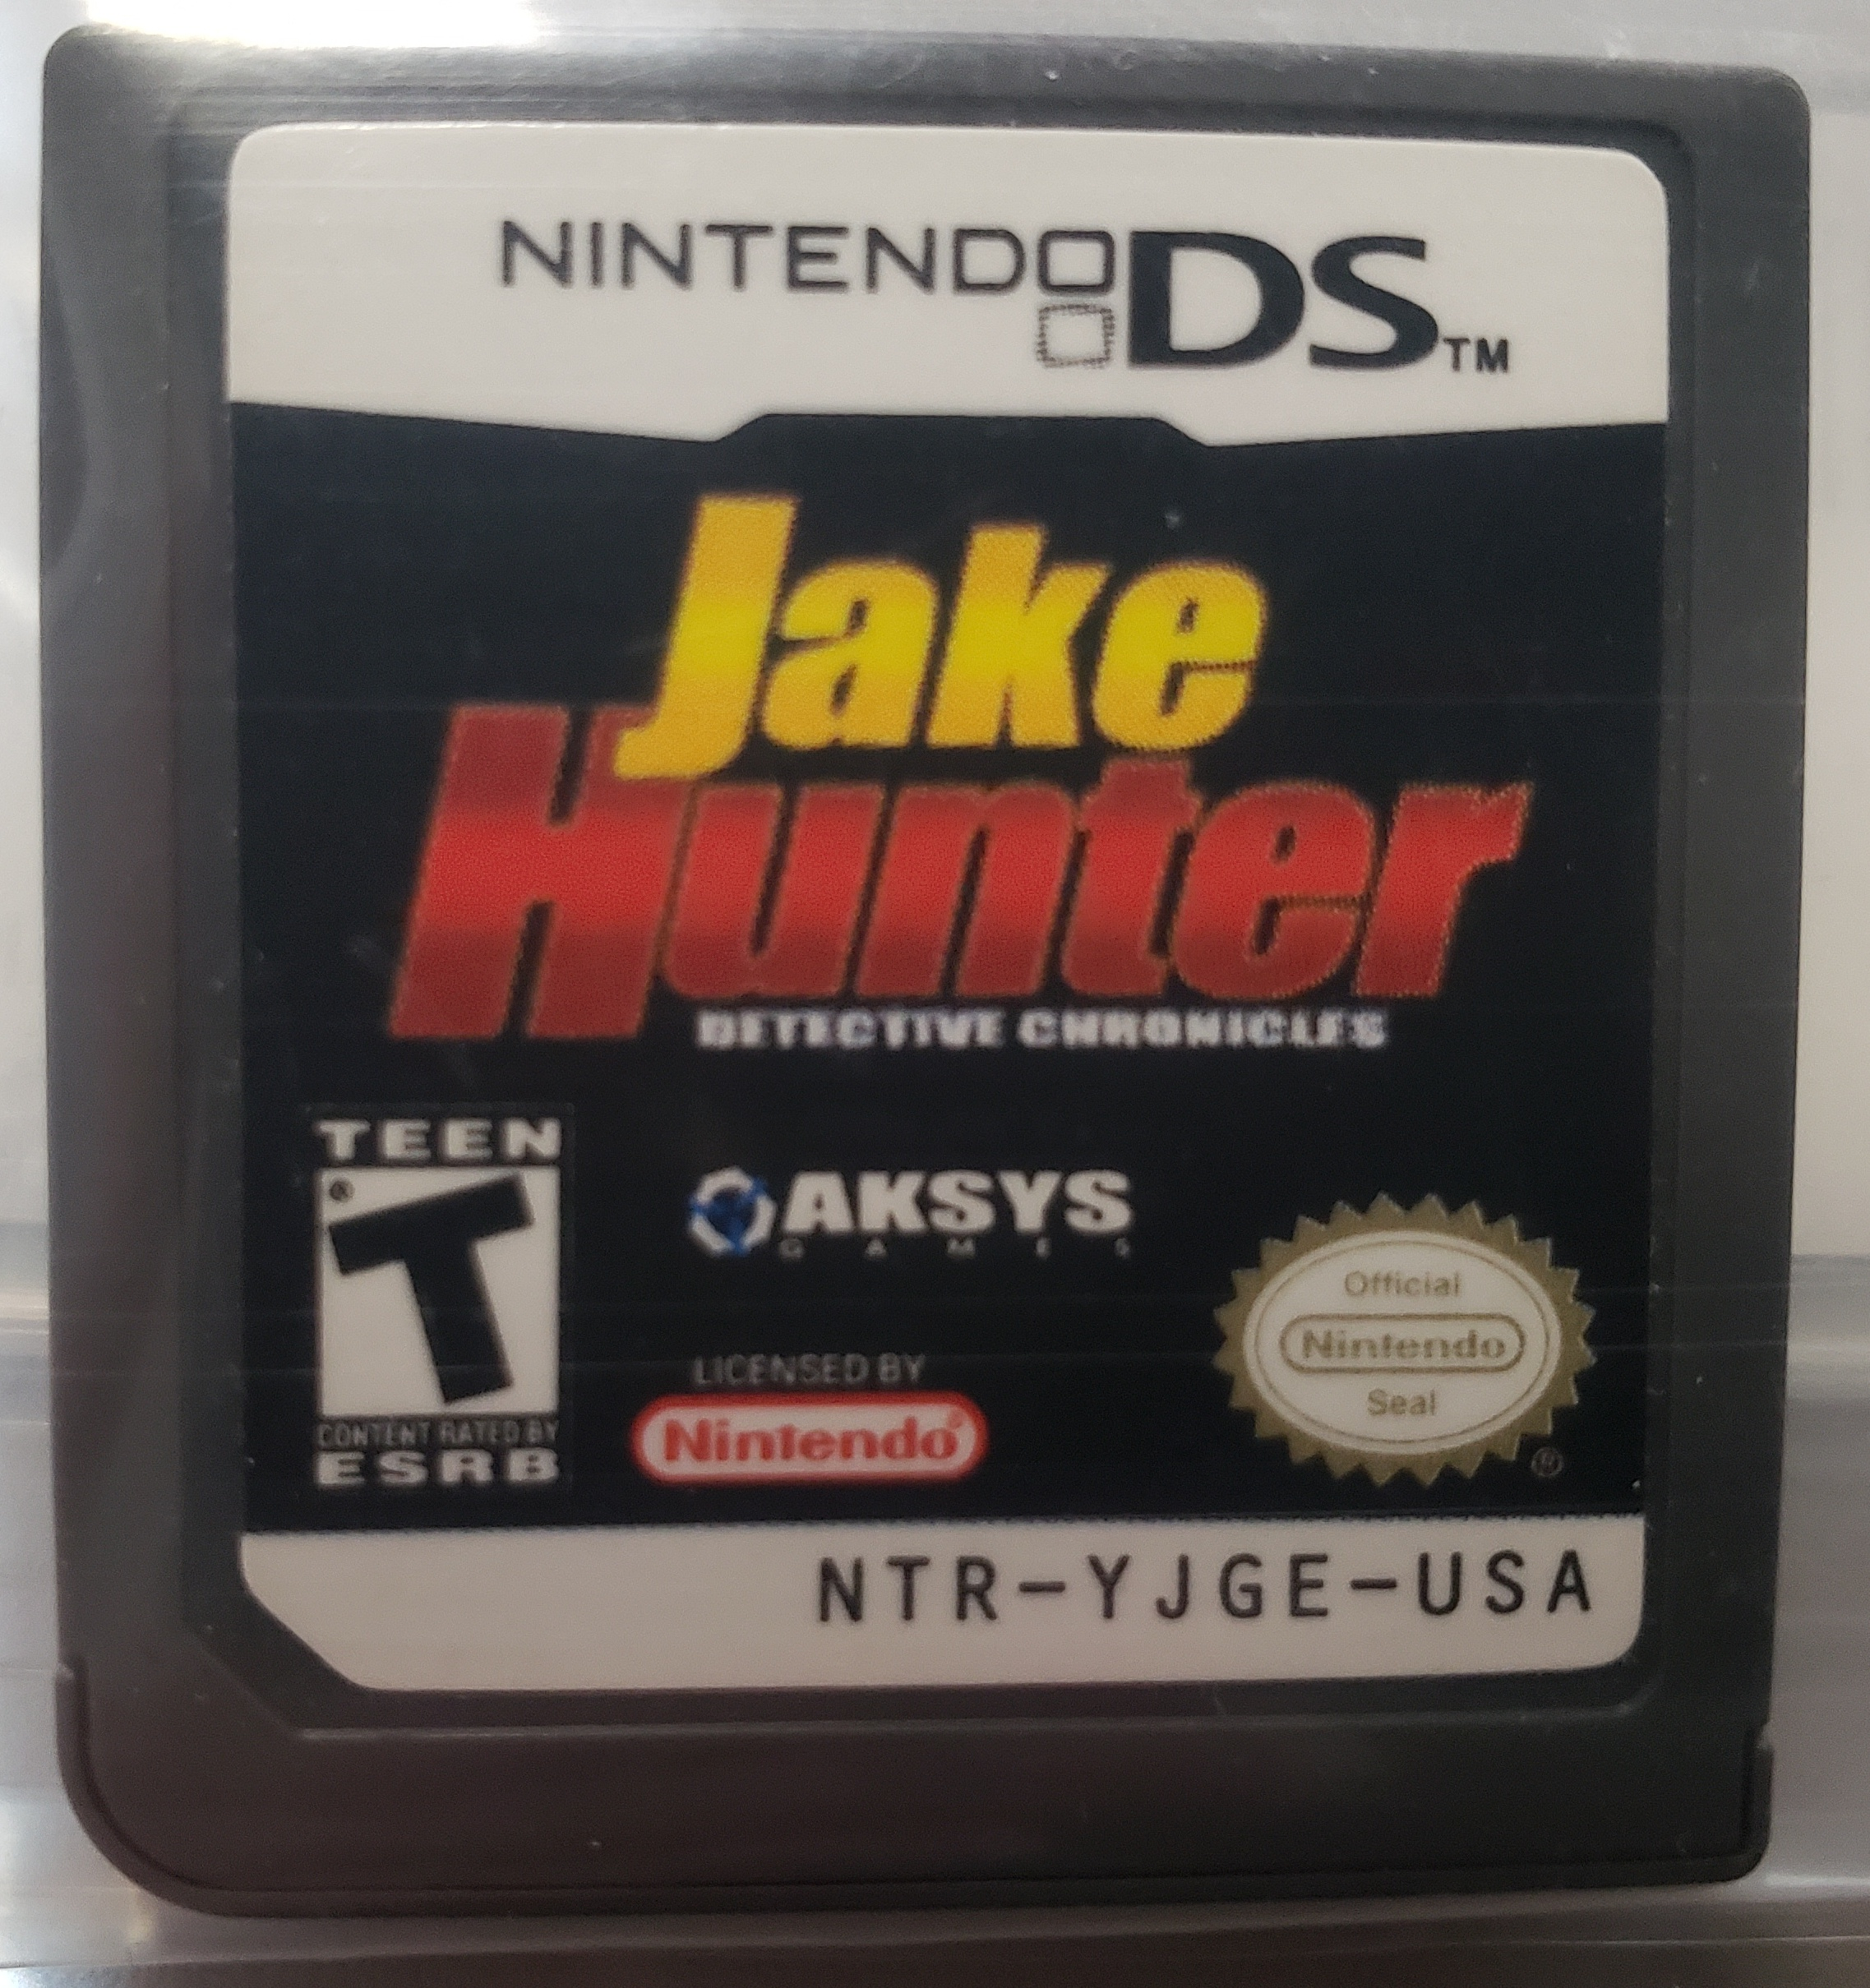 JAKE HUNTER DETECTIVE CHRONICLES, NINTENDO DS GAME